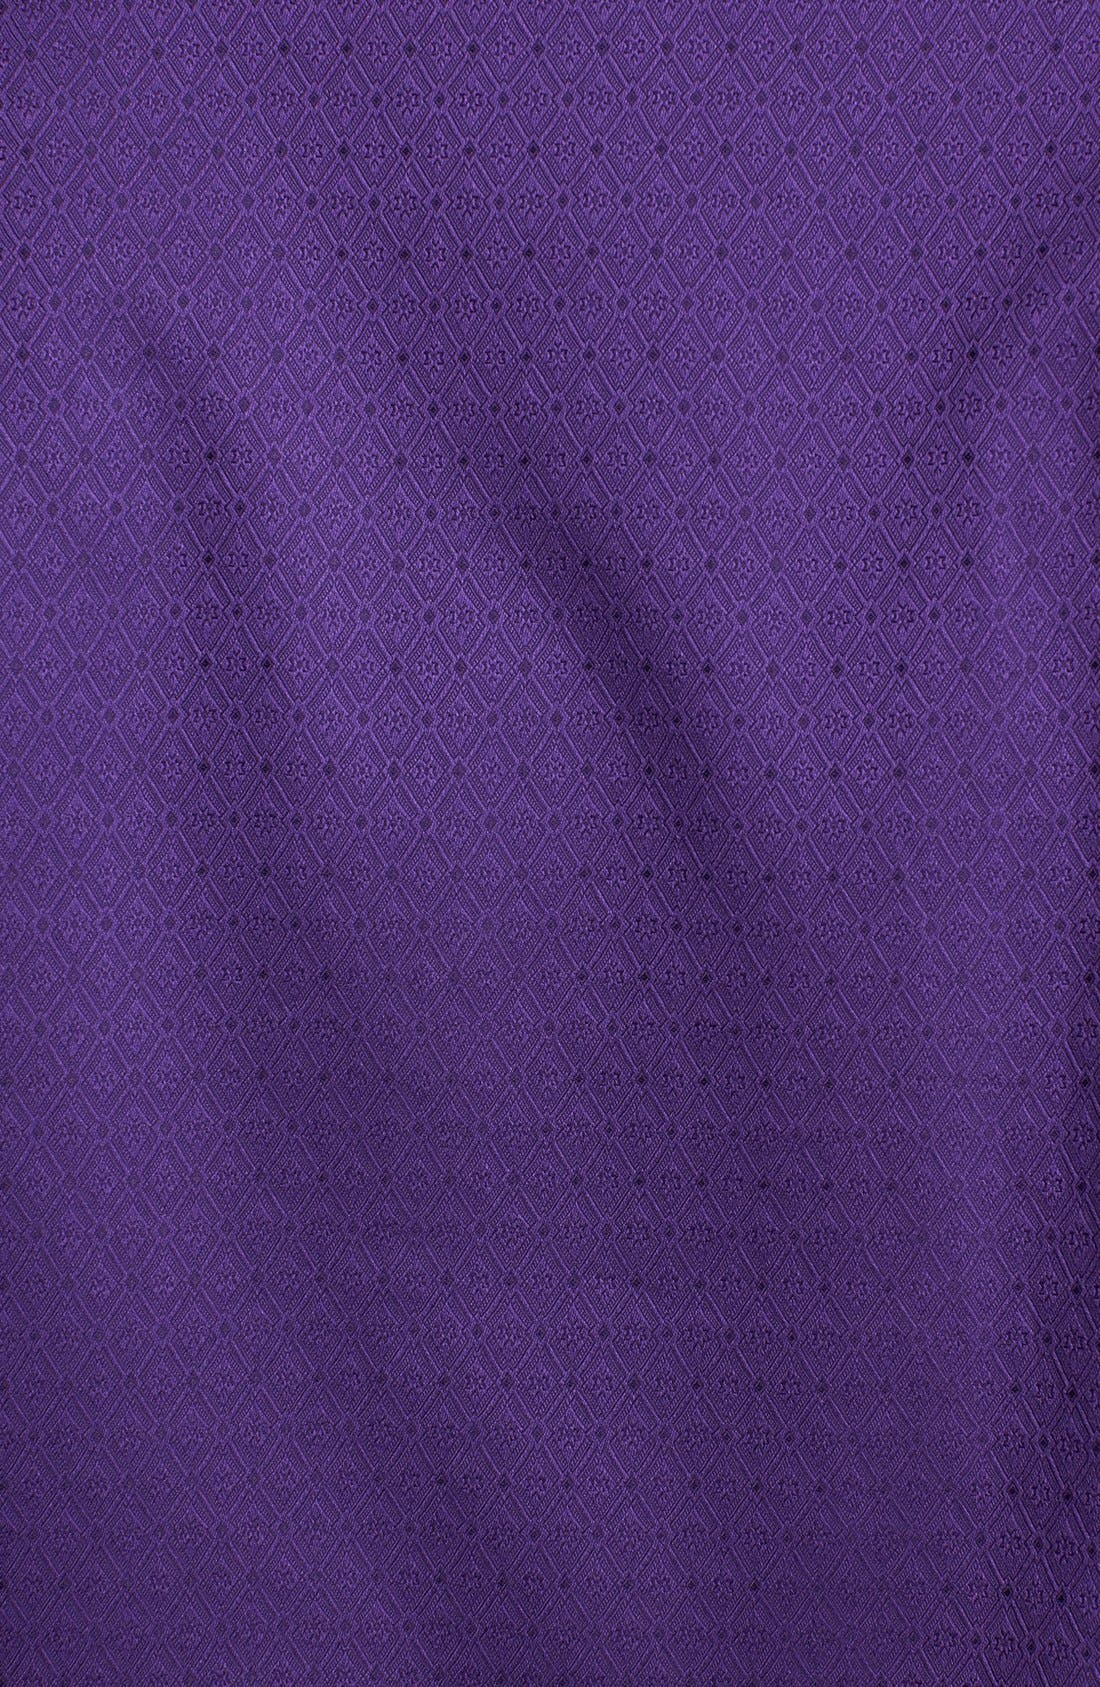 'Astiral' Sport Shirt,                             Alternate thumbnail 5, color,                             510